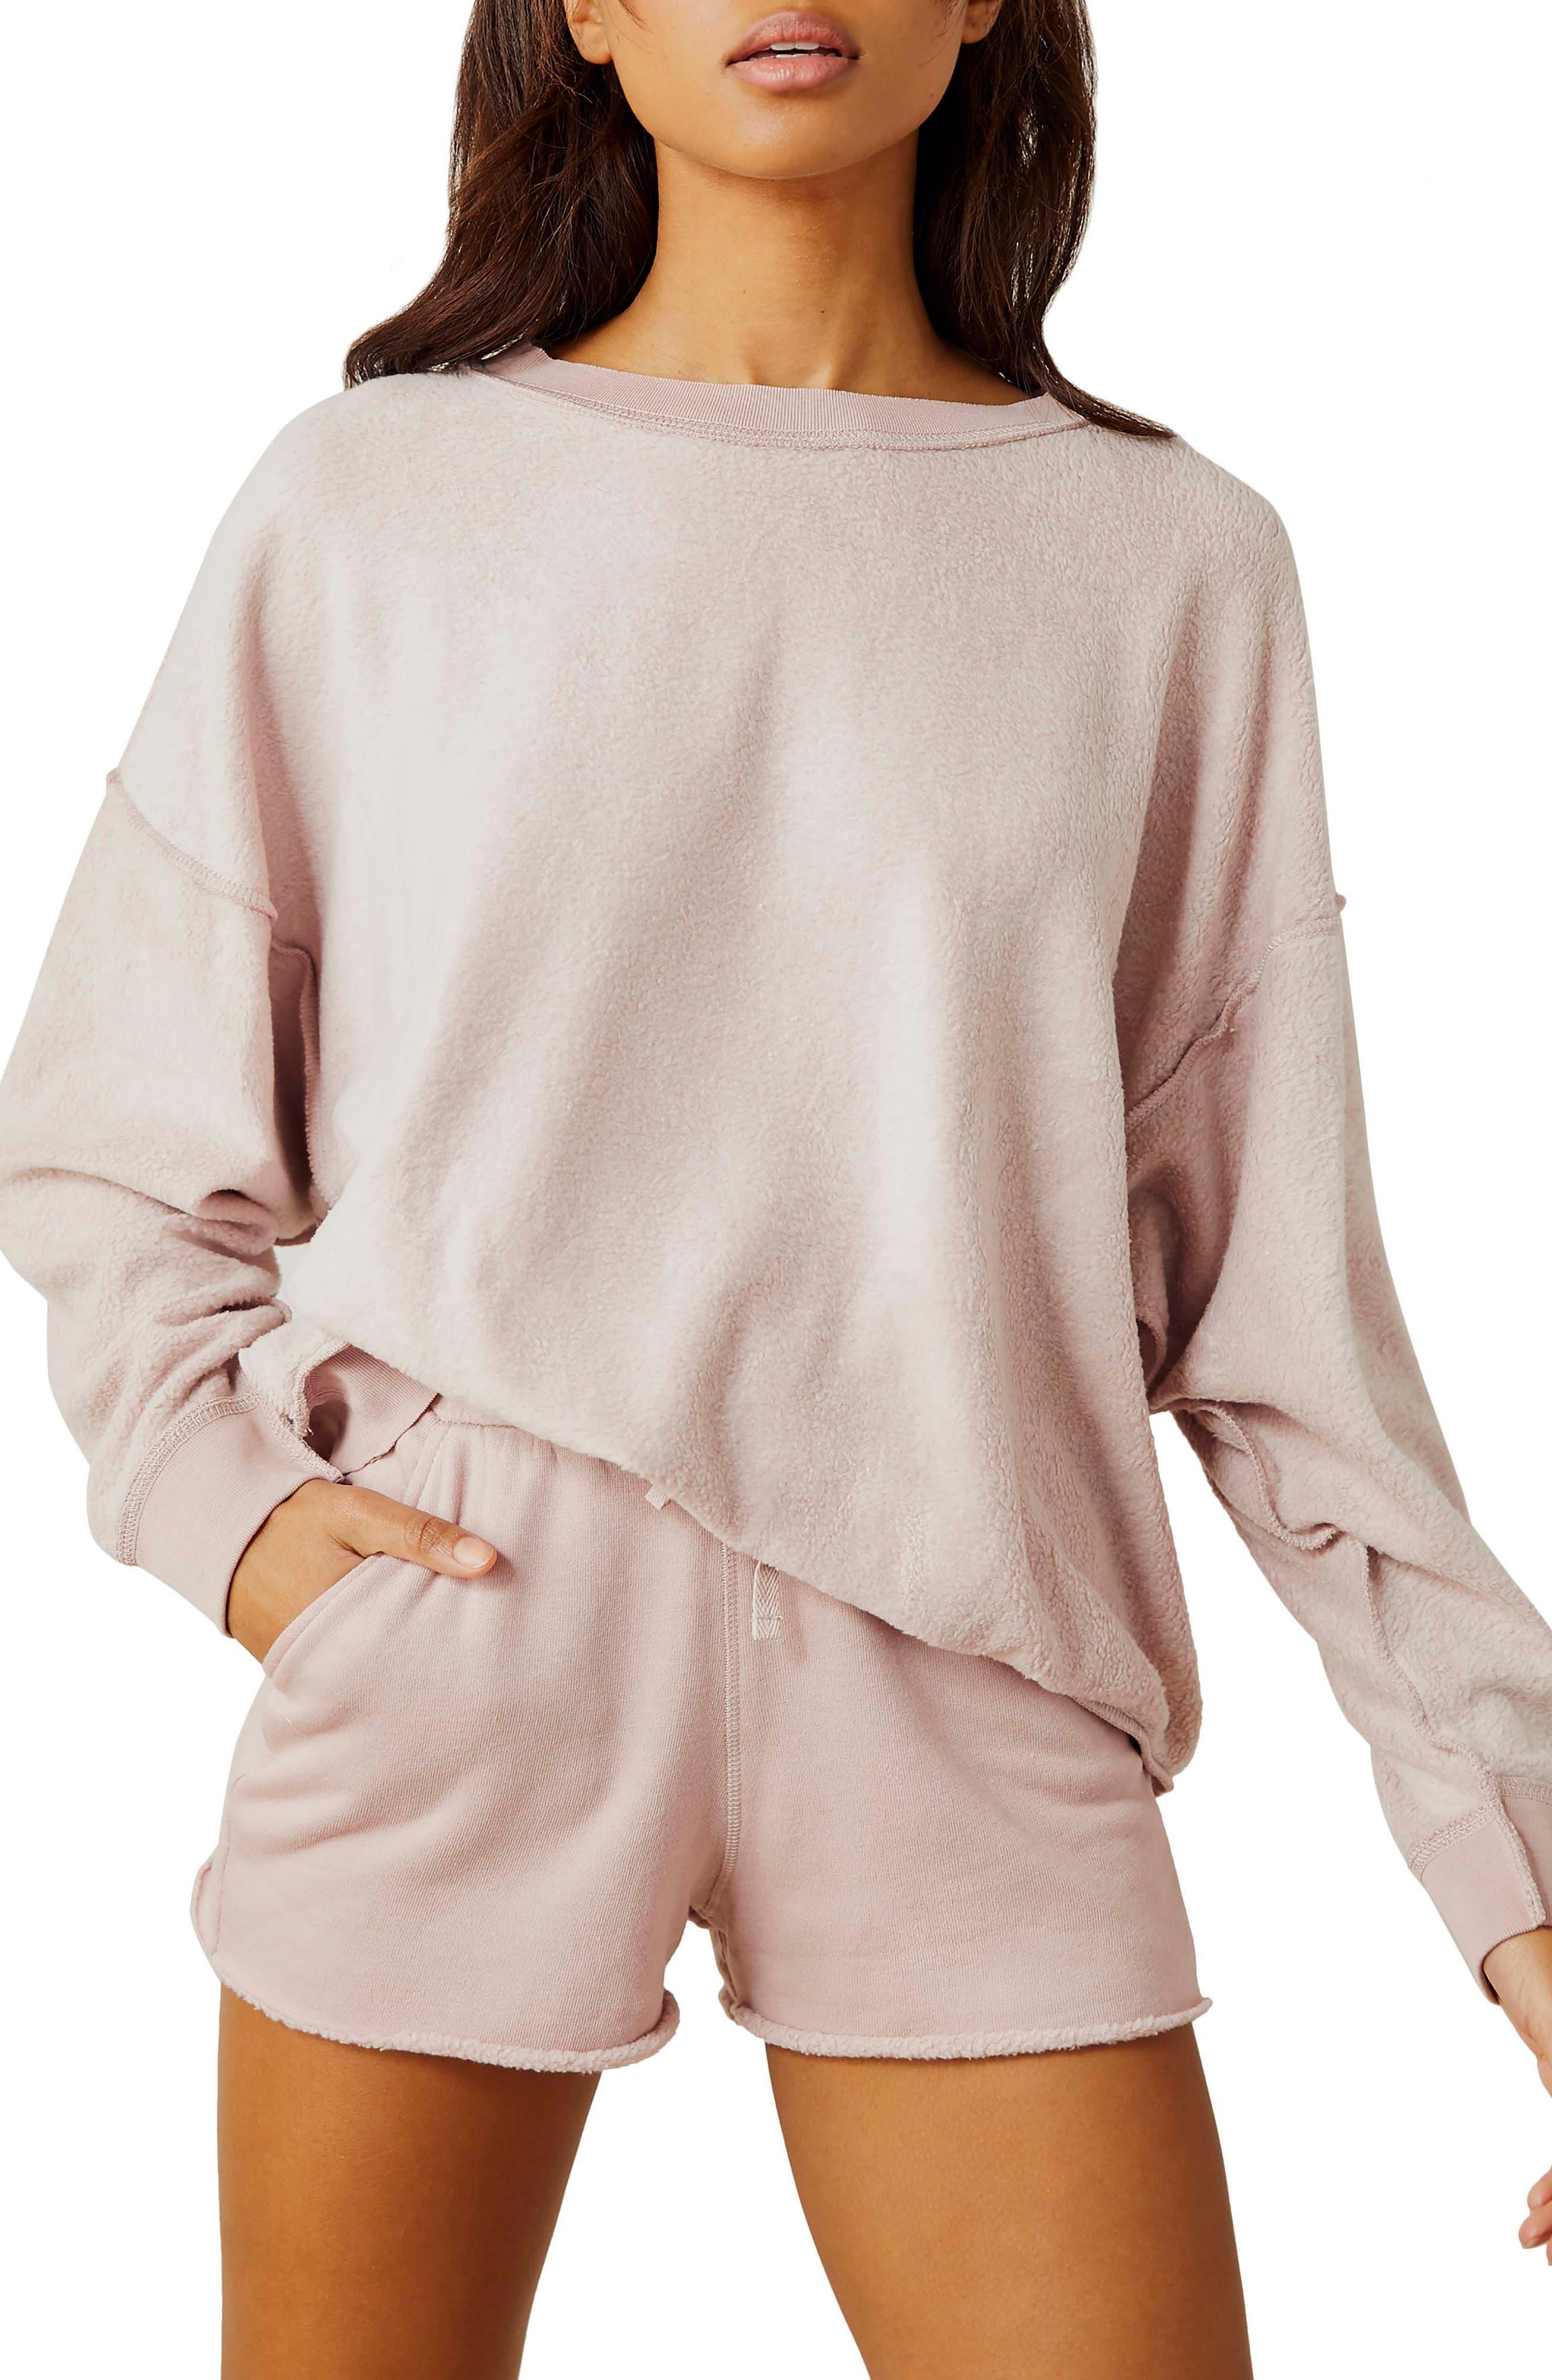 Free People Womens Clara Orange Plunging Layering Tee Tank Top Shirt L BHFO 3196